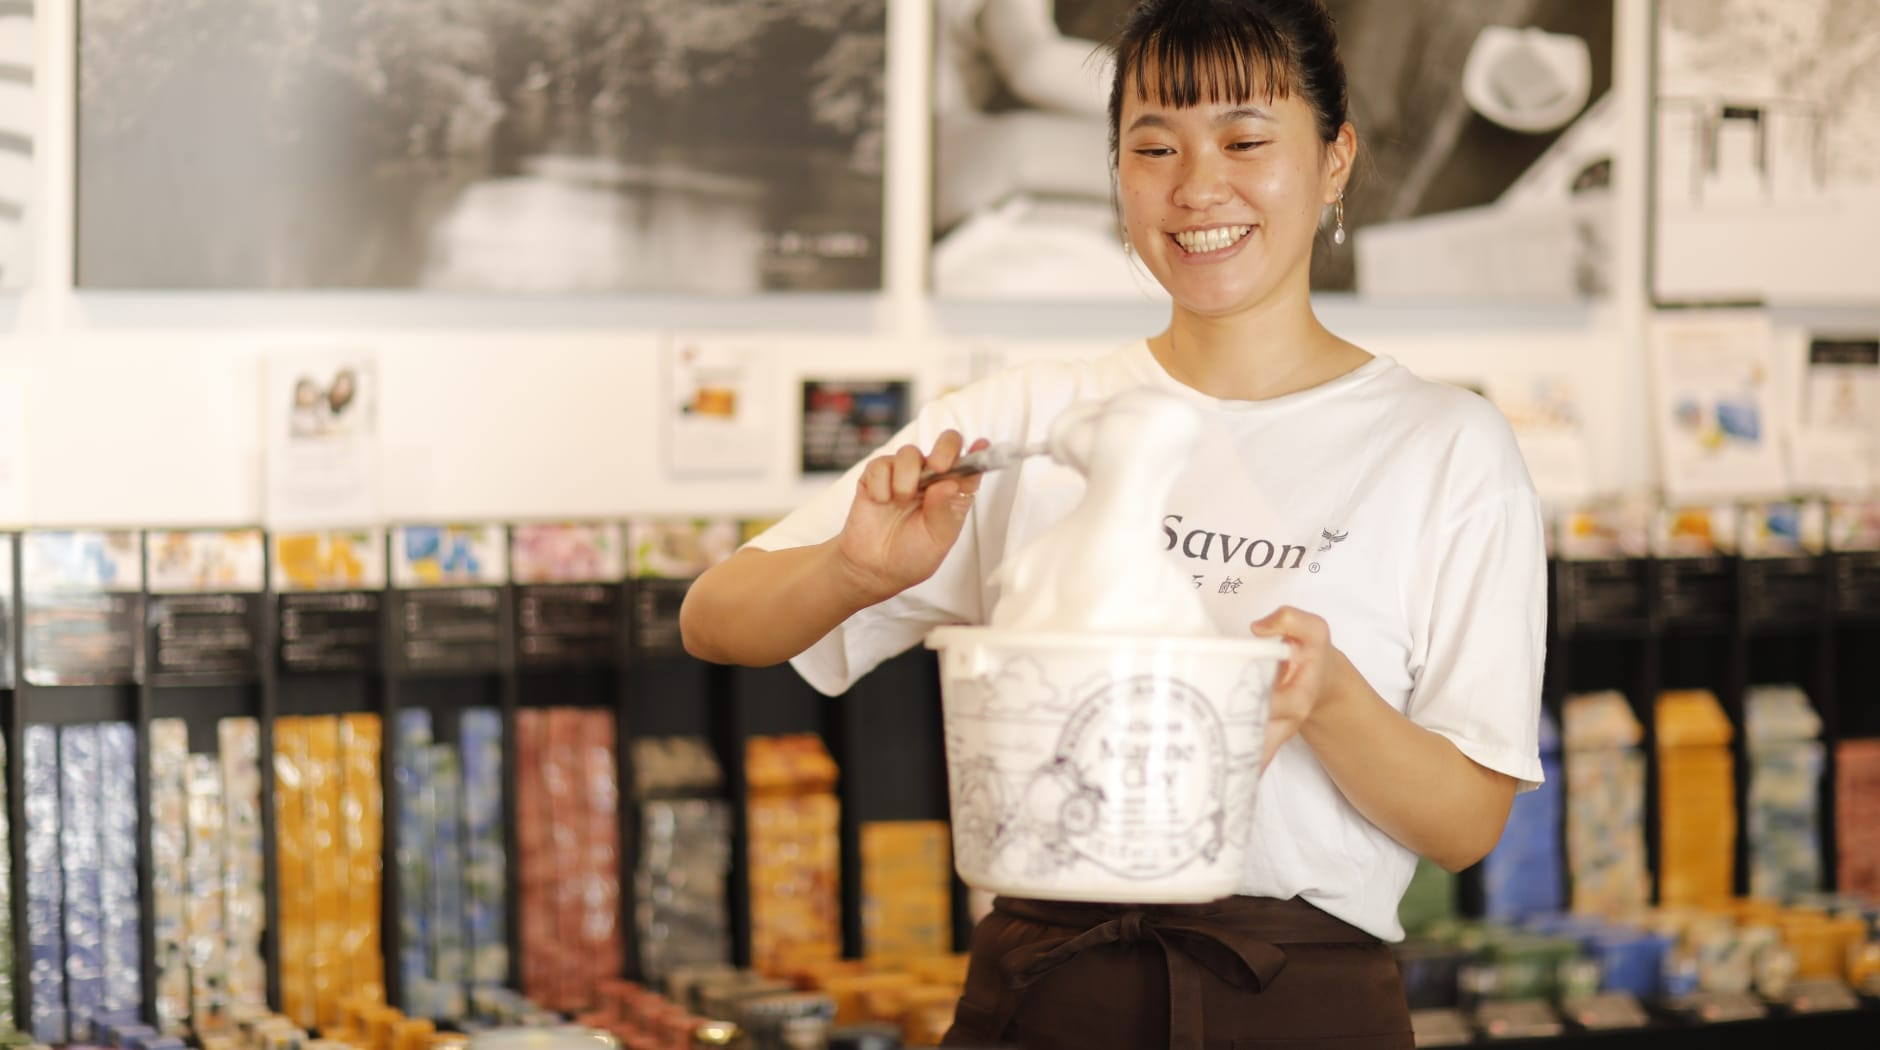 SuiSavon 首里石鹸 当蔵本店